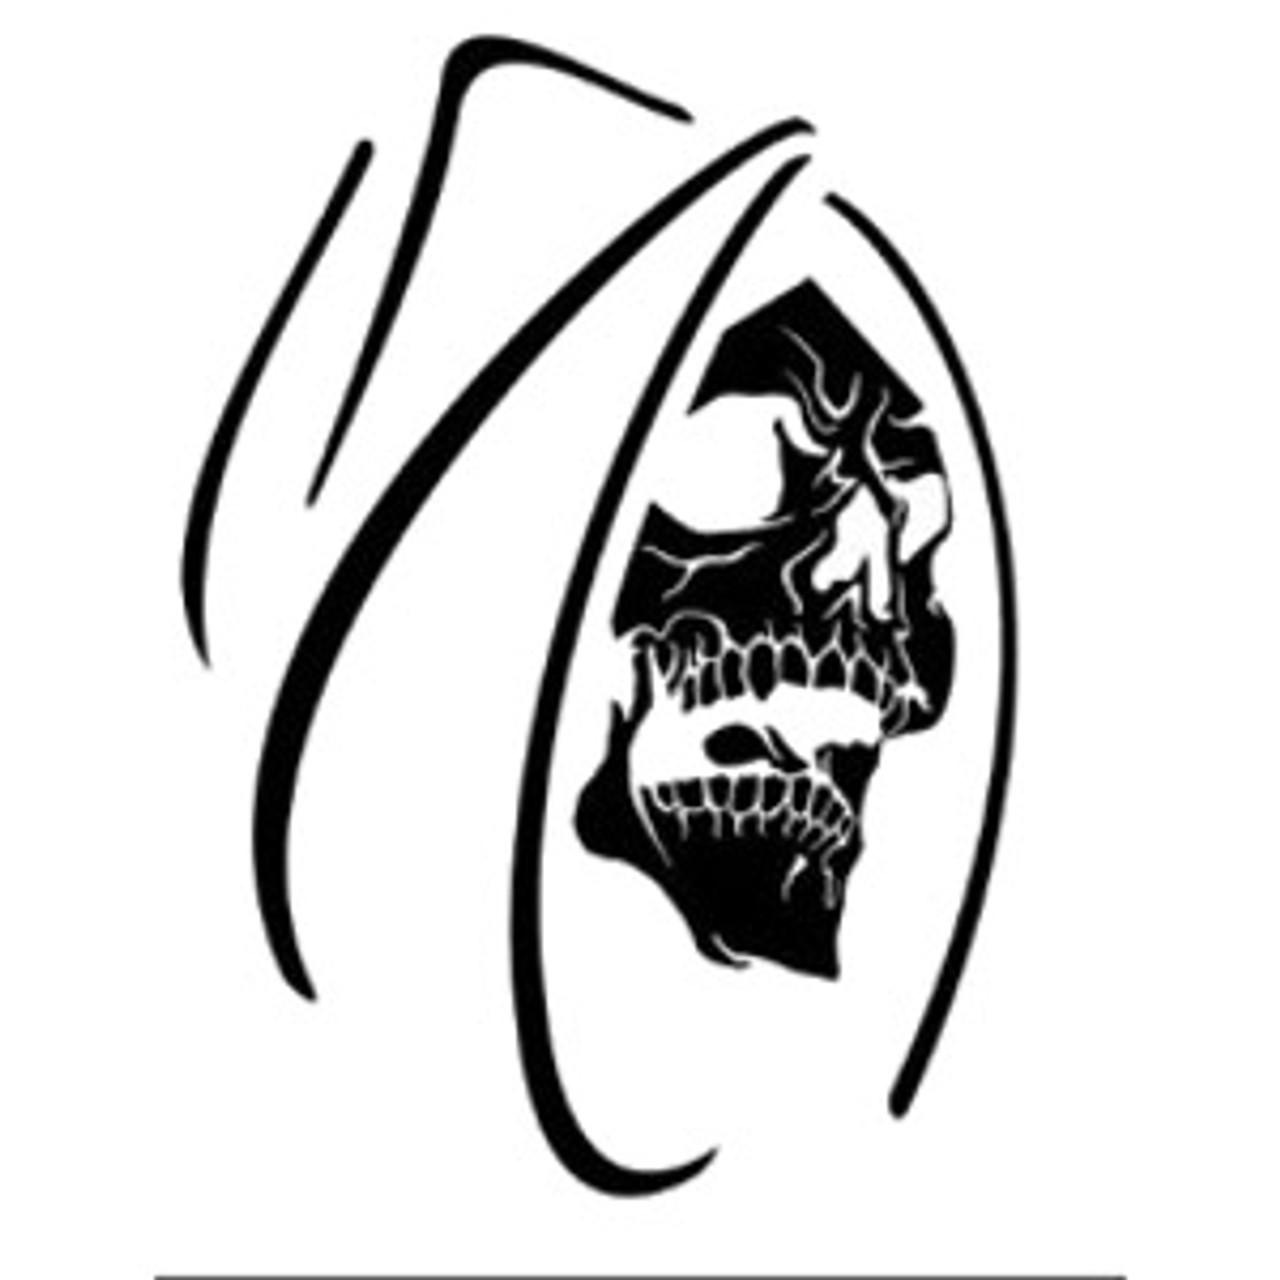 Grim reaper skull decal 78902 1464722244 jpgc2imbypasson